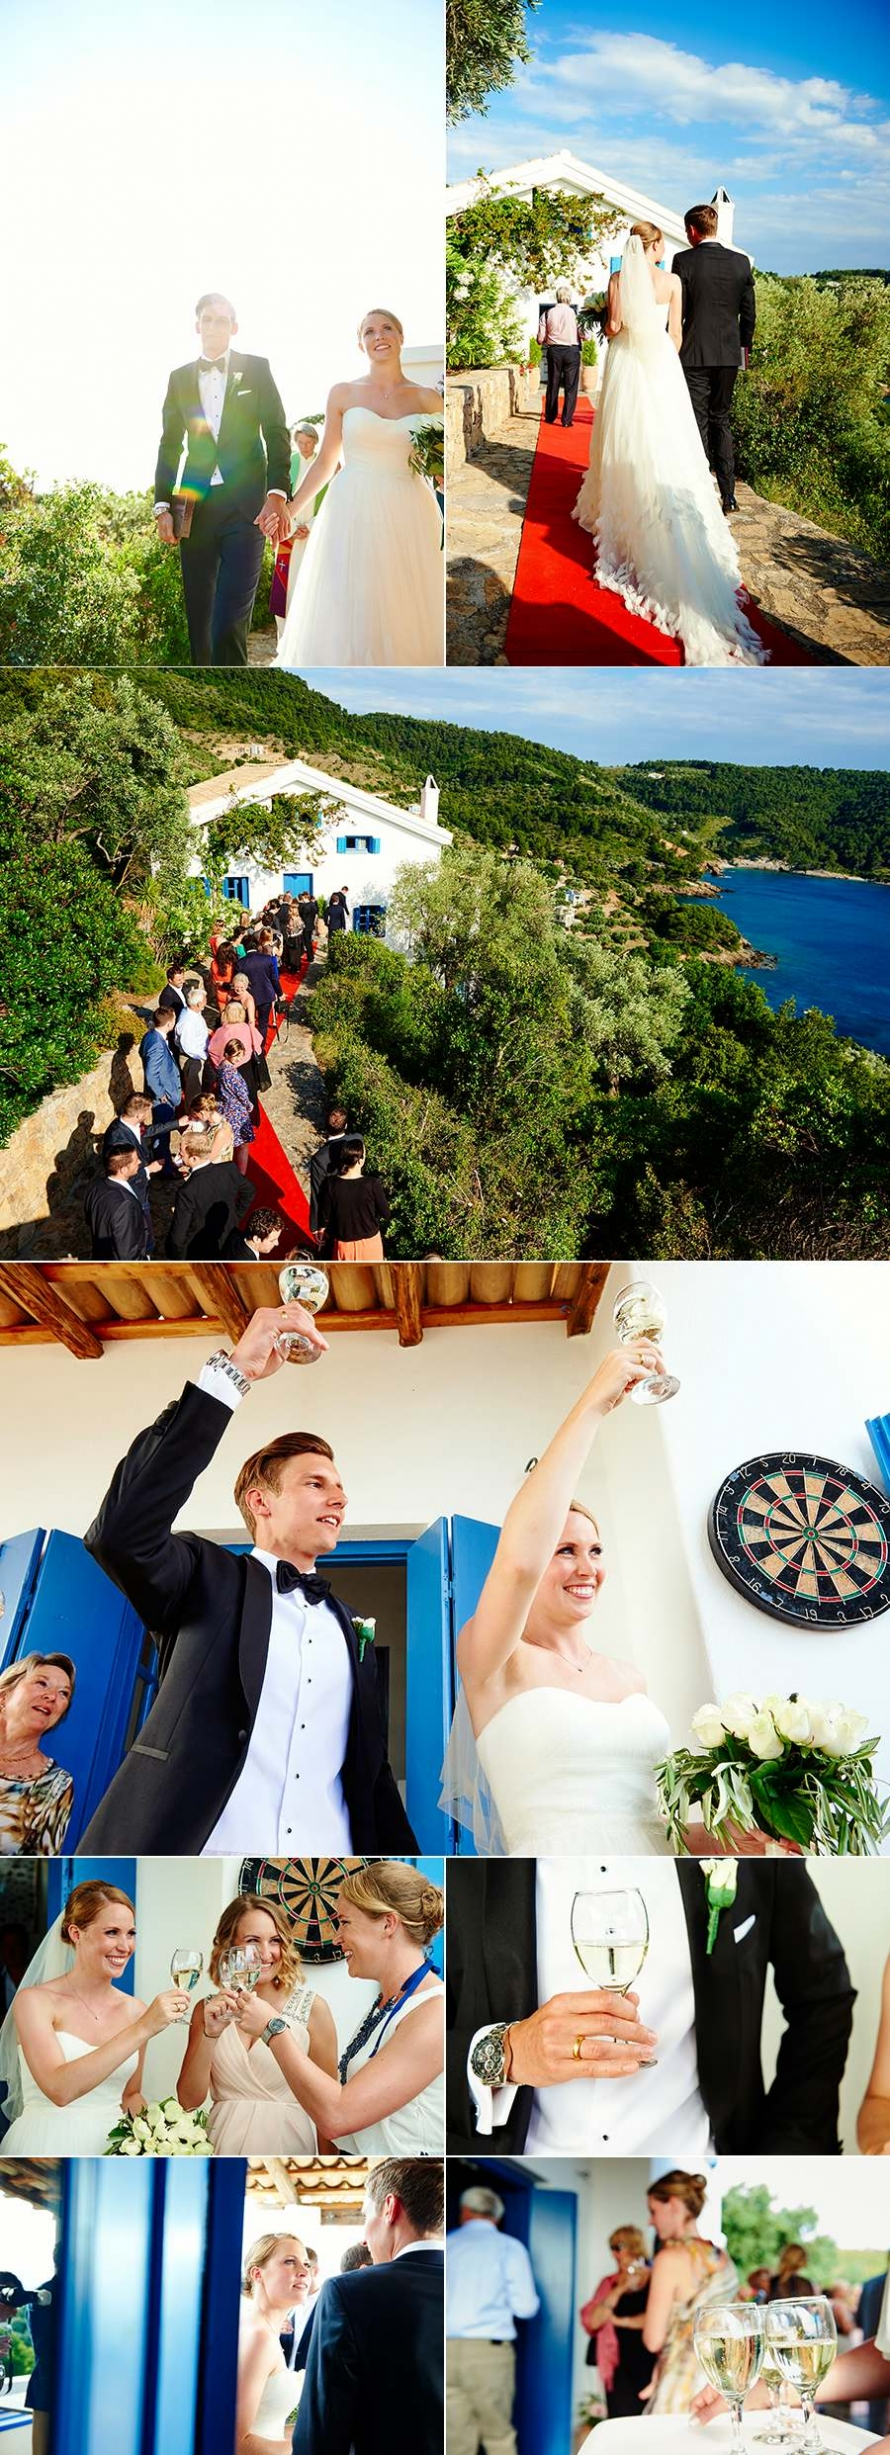 Tobi & Vanessa wedding photos 16